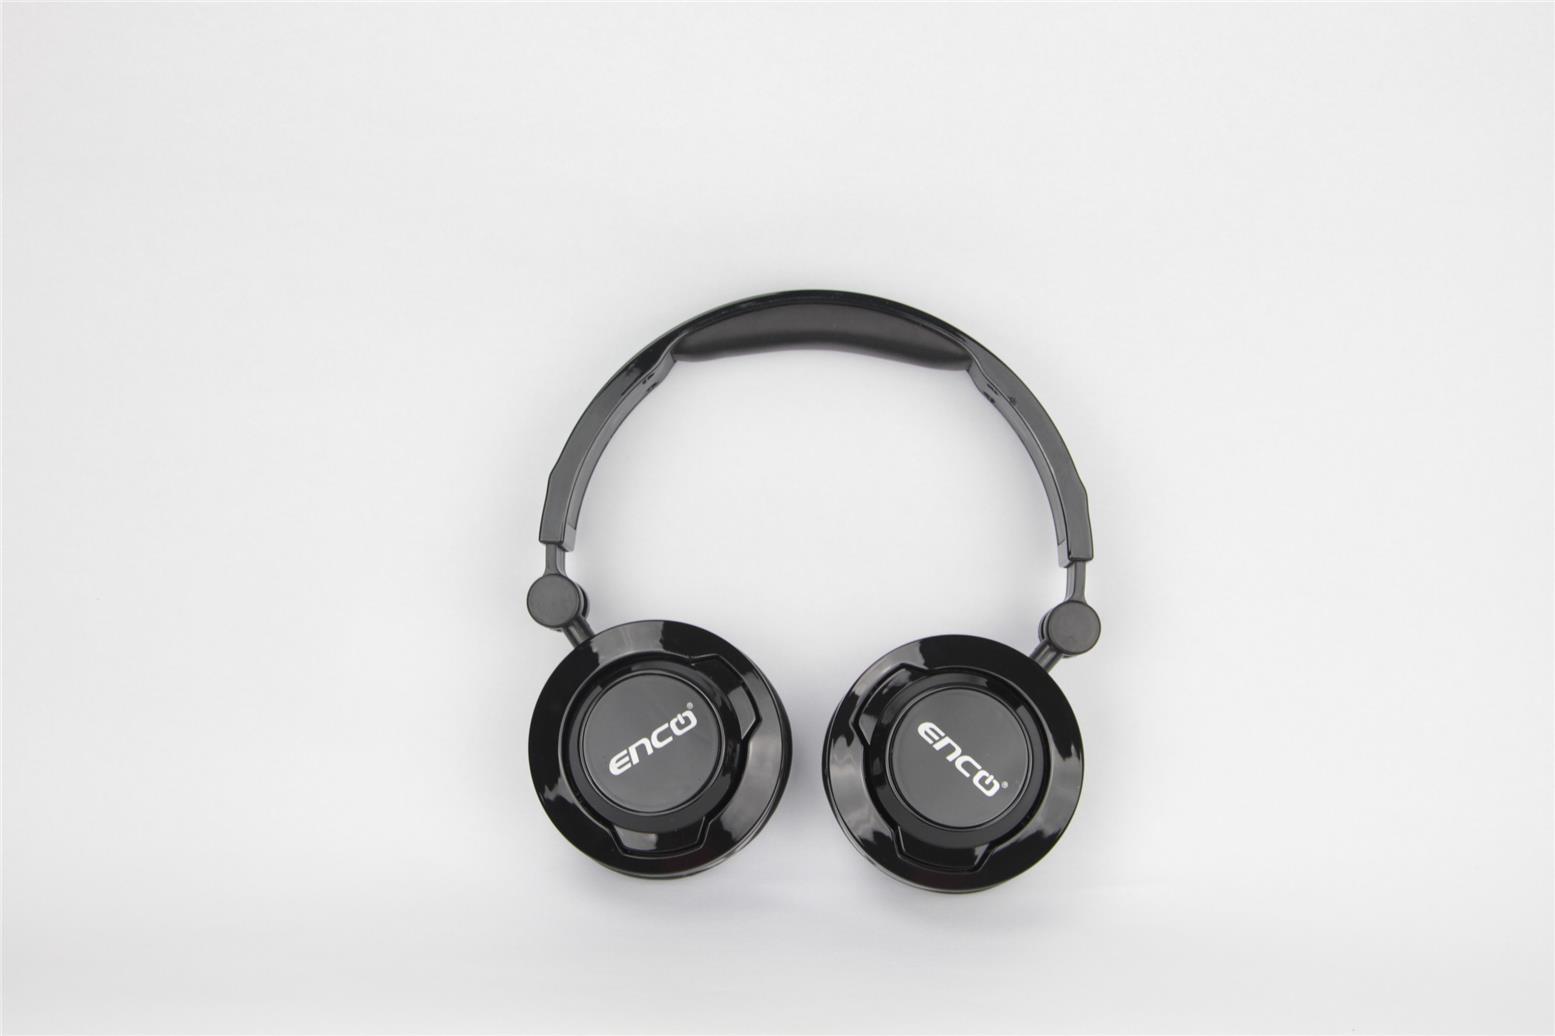 Enco AH500 Foldable Stereo Headset Black